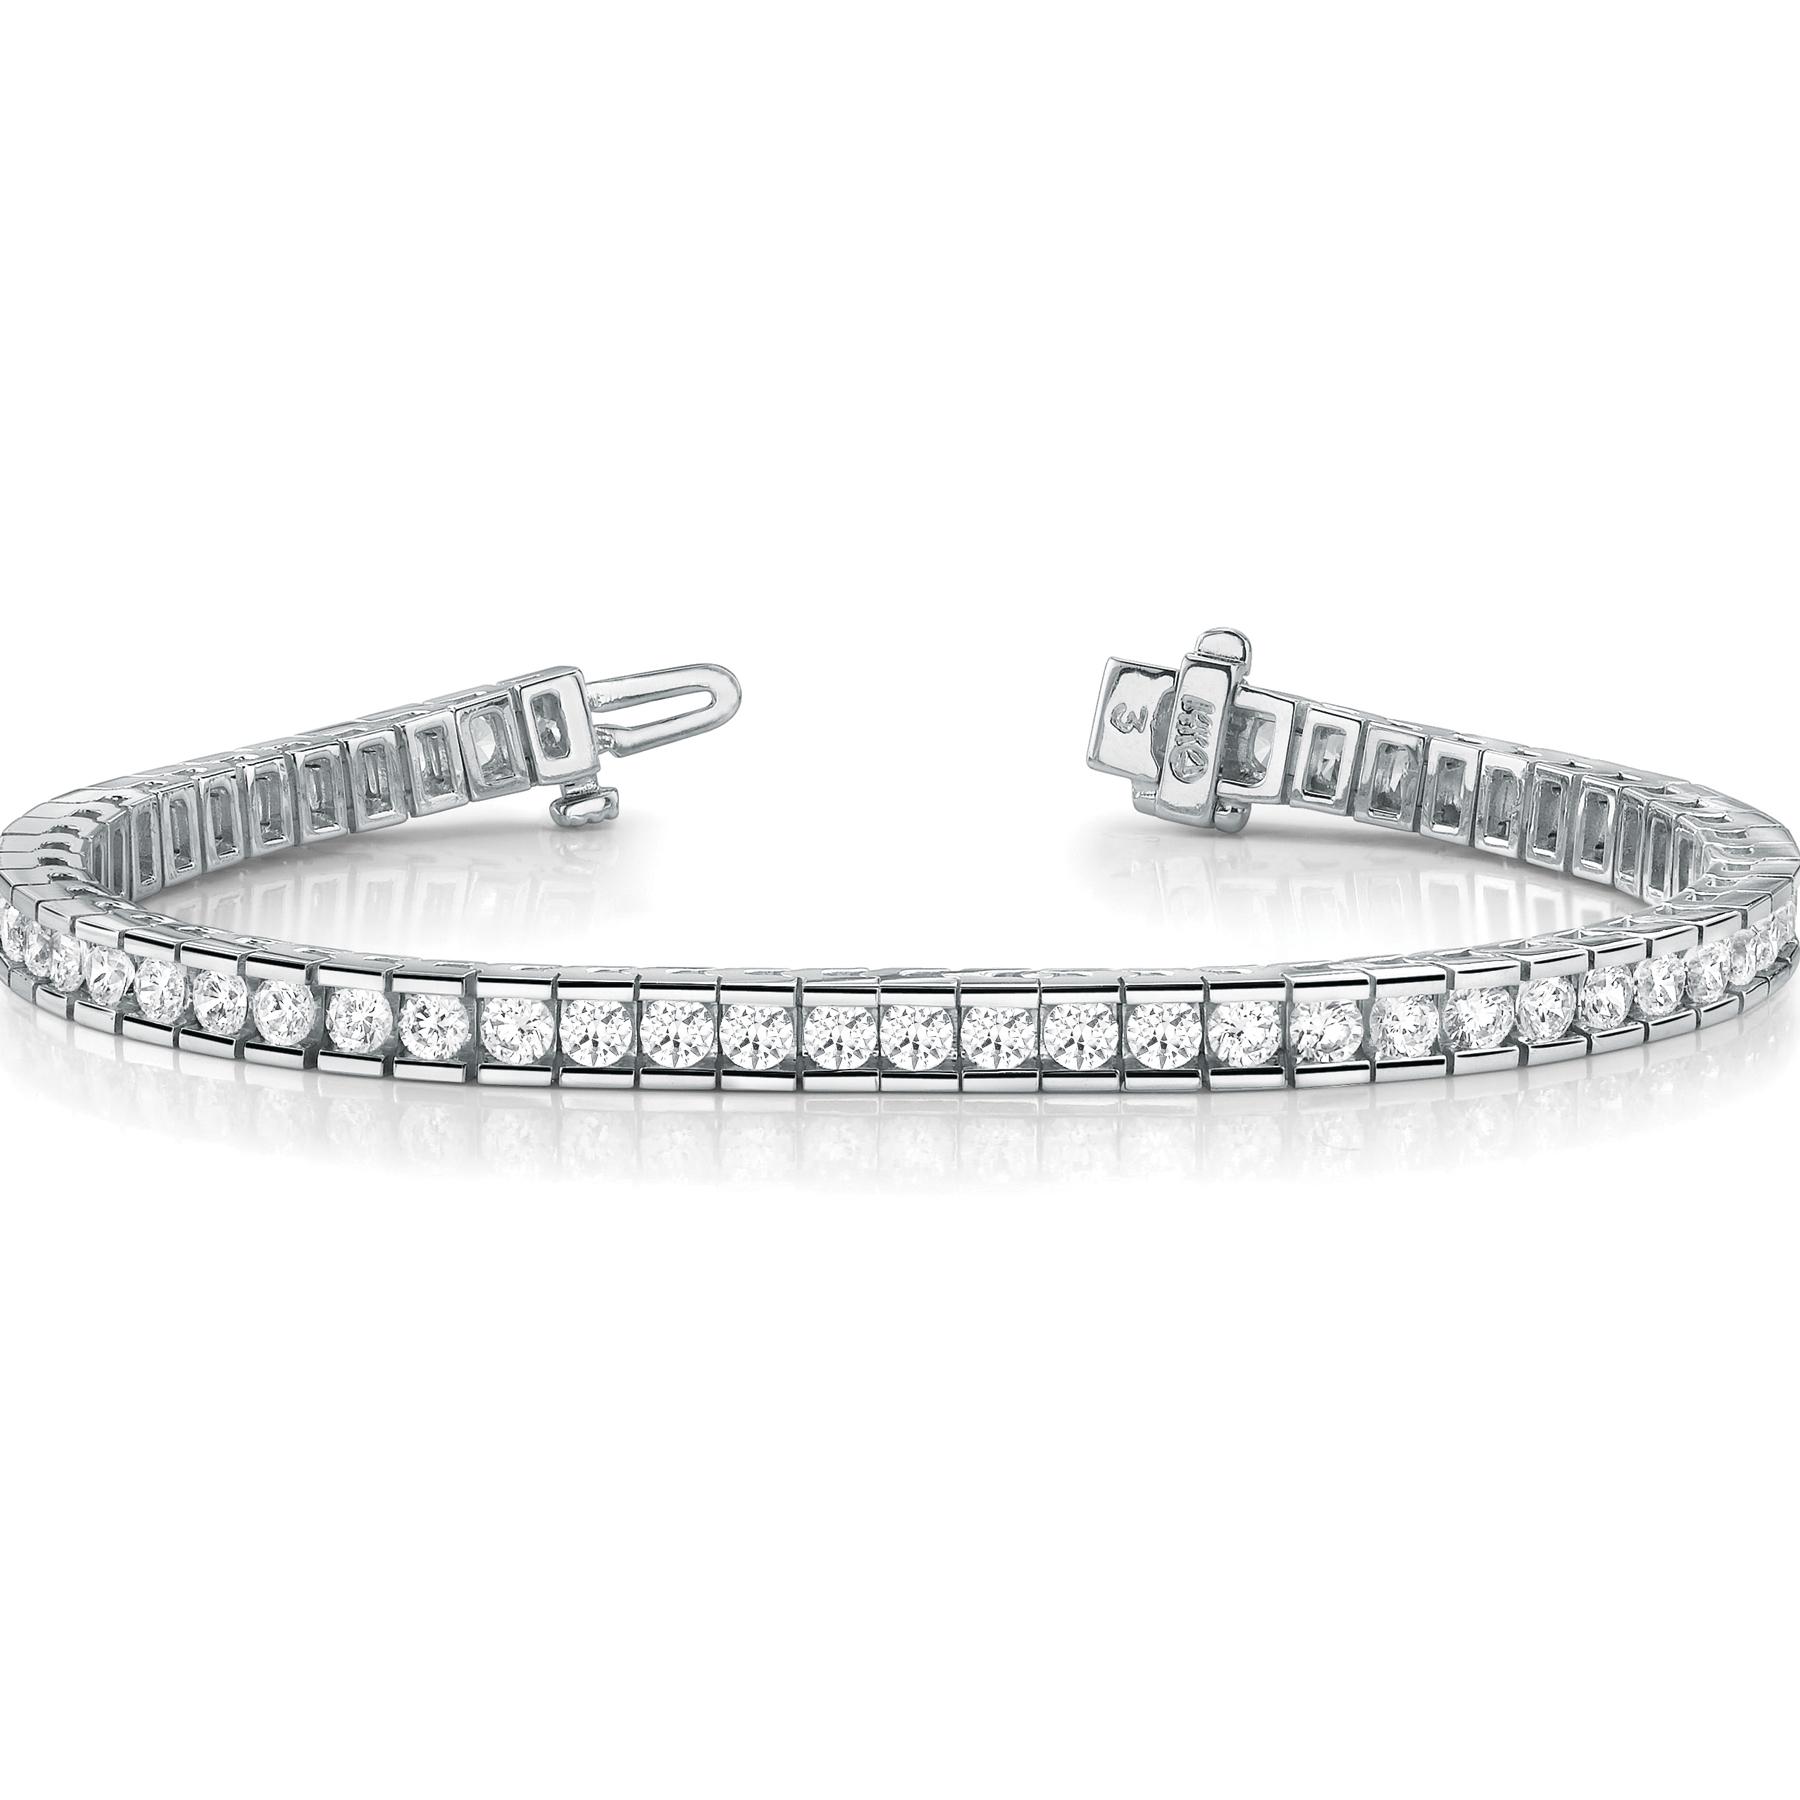 14k-white-gold-channel-set-tennis-diamond-bracelet-4489-10-05